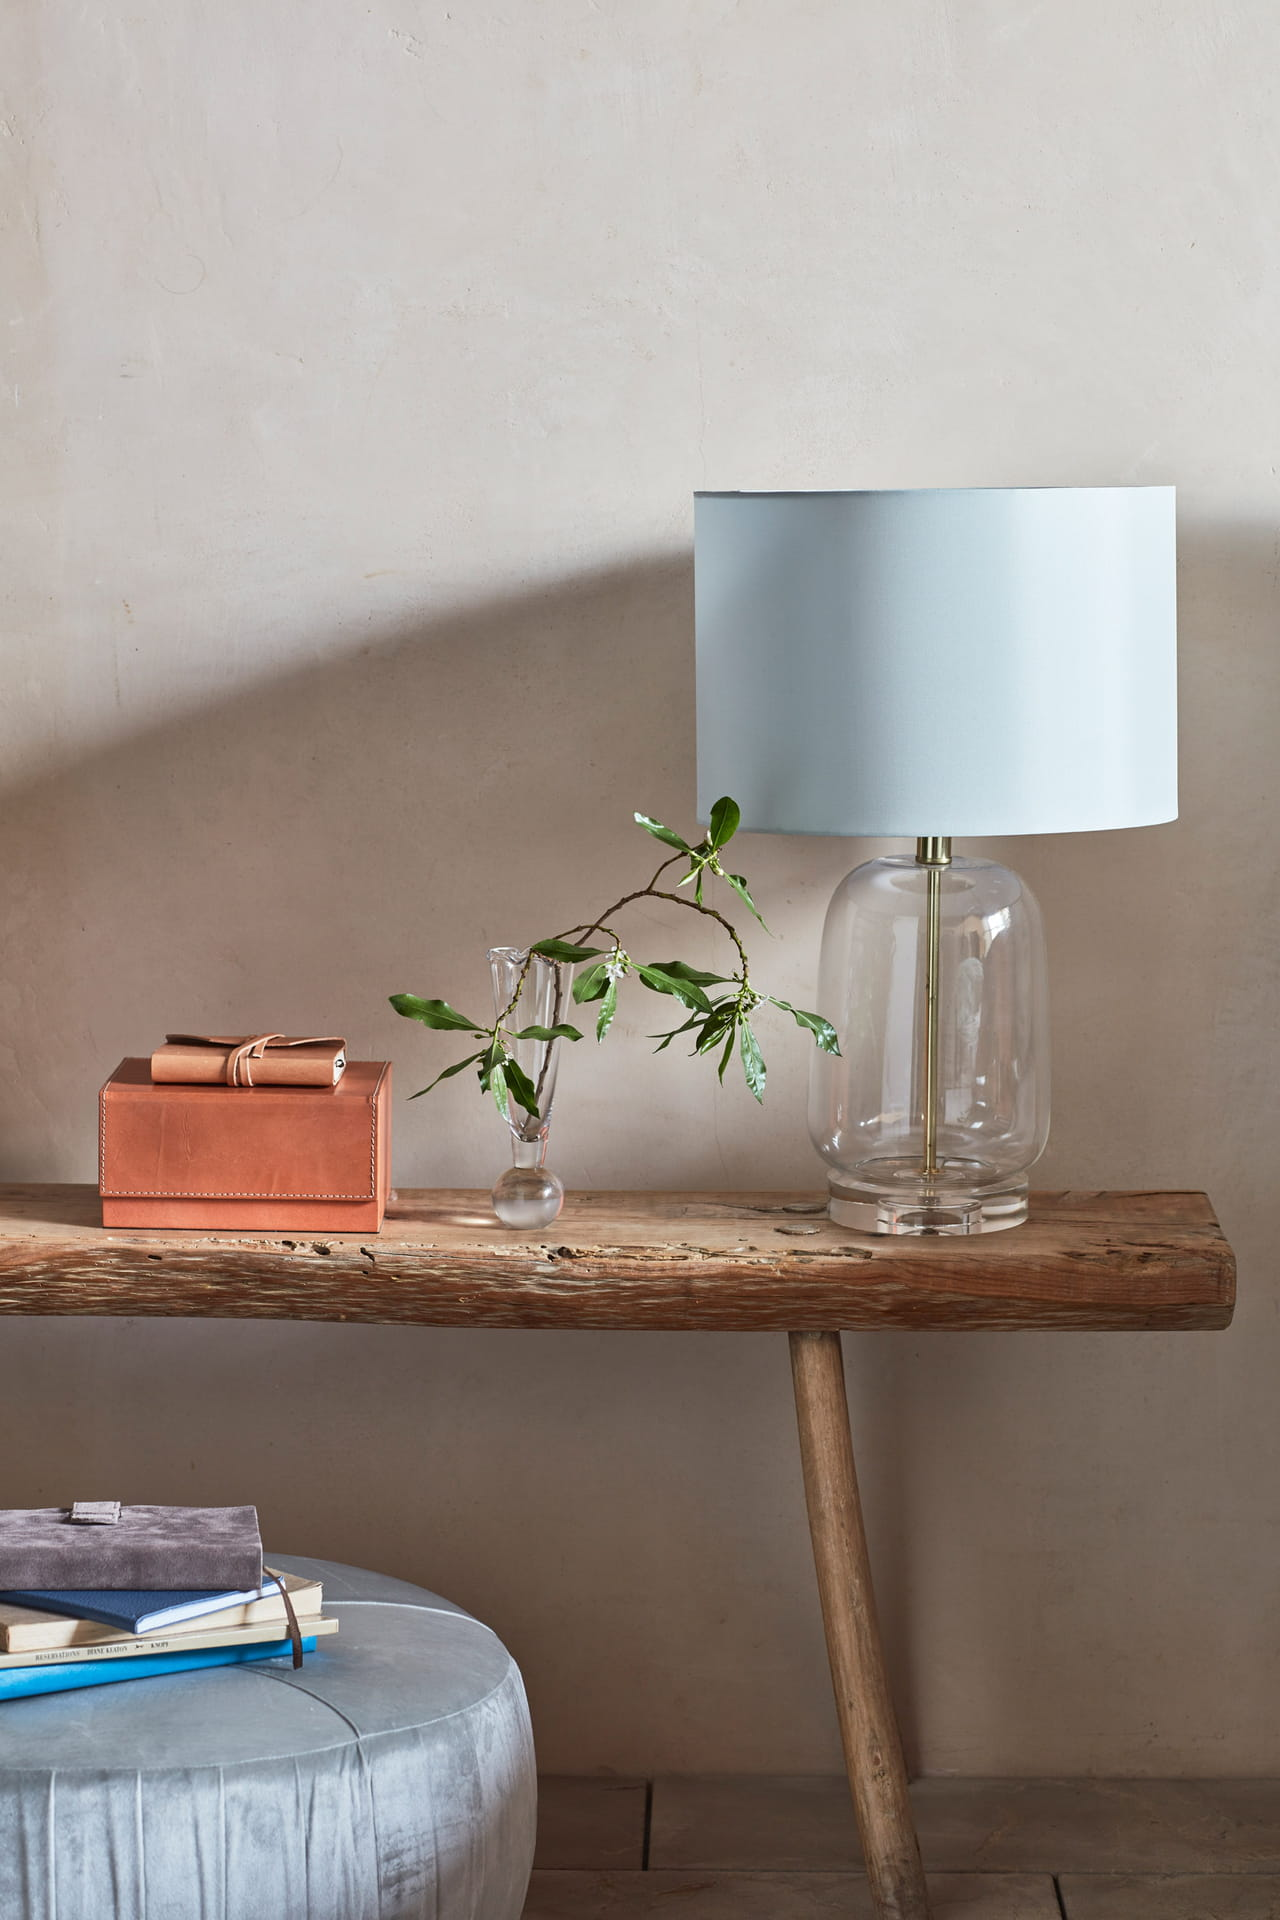 Tqrdhcsx Zara En Home Lampe Verre dhQrtsCx